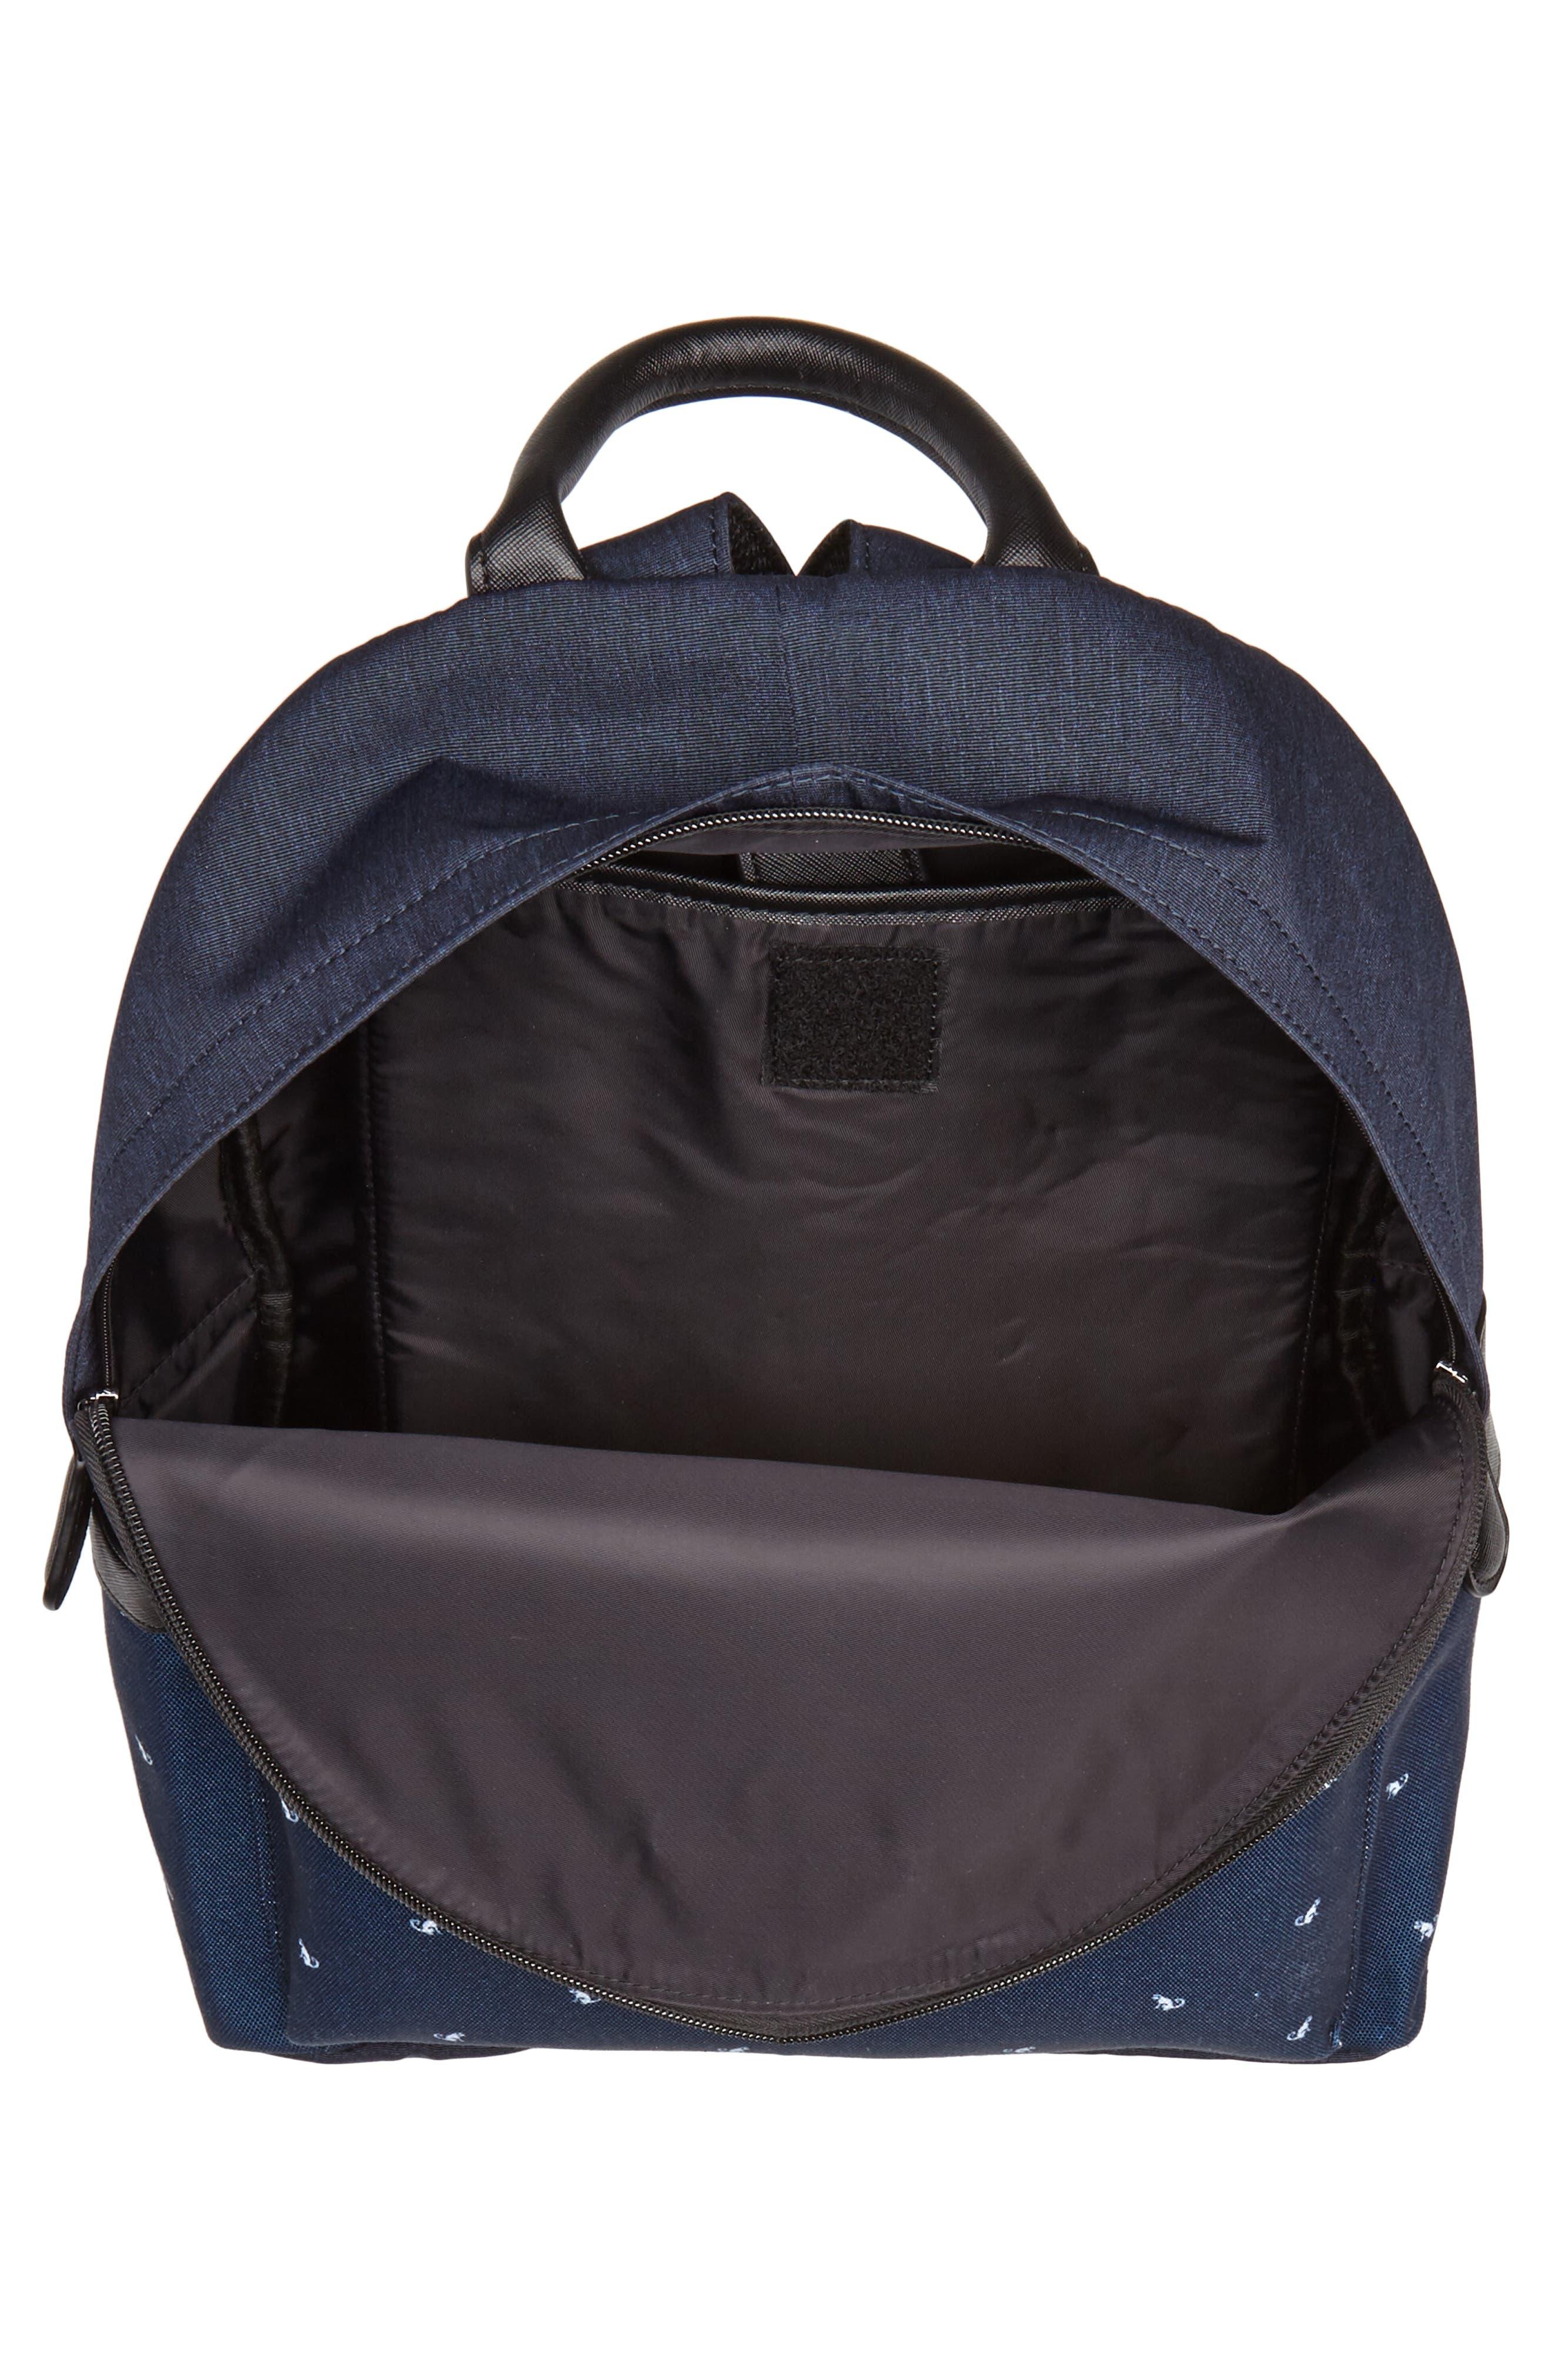 Mangoo Backpack,                             Alternate thumbnail 4, color,                             Navy